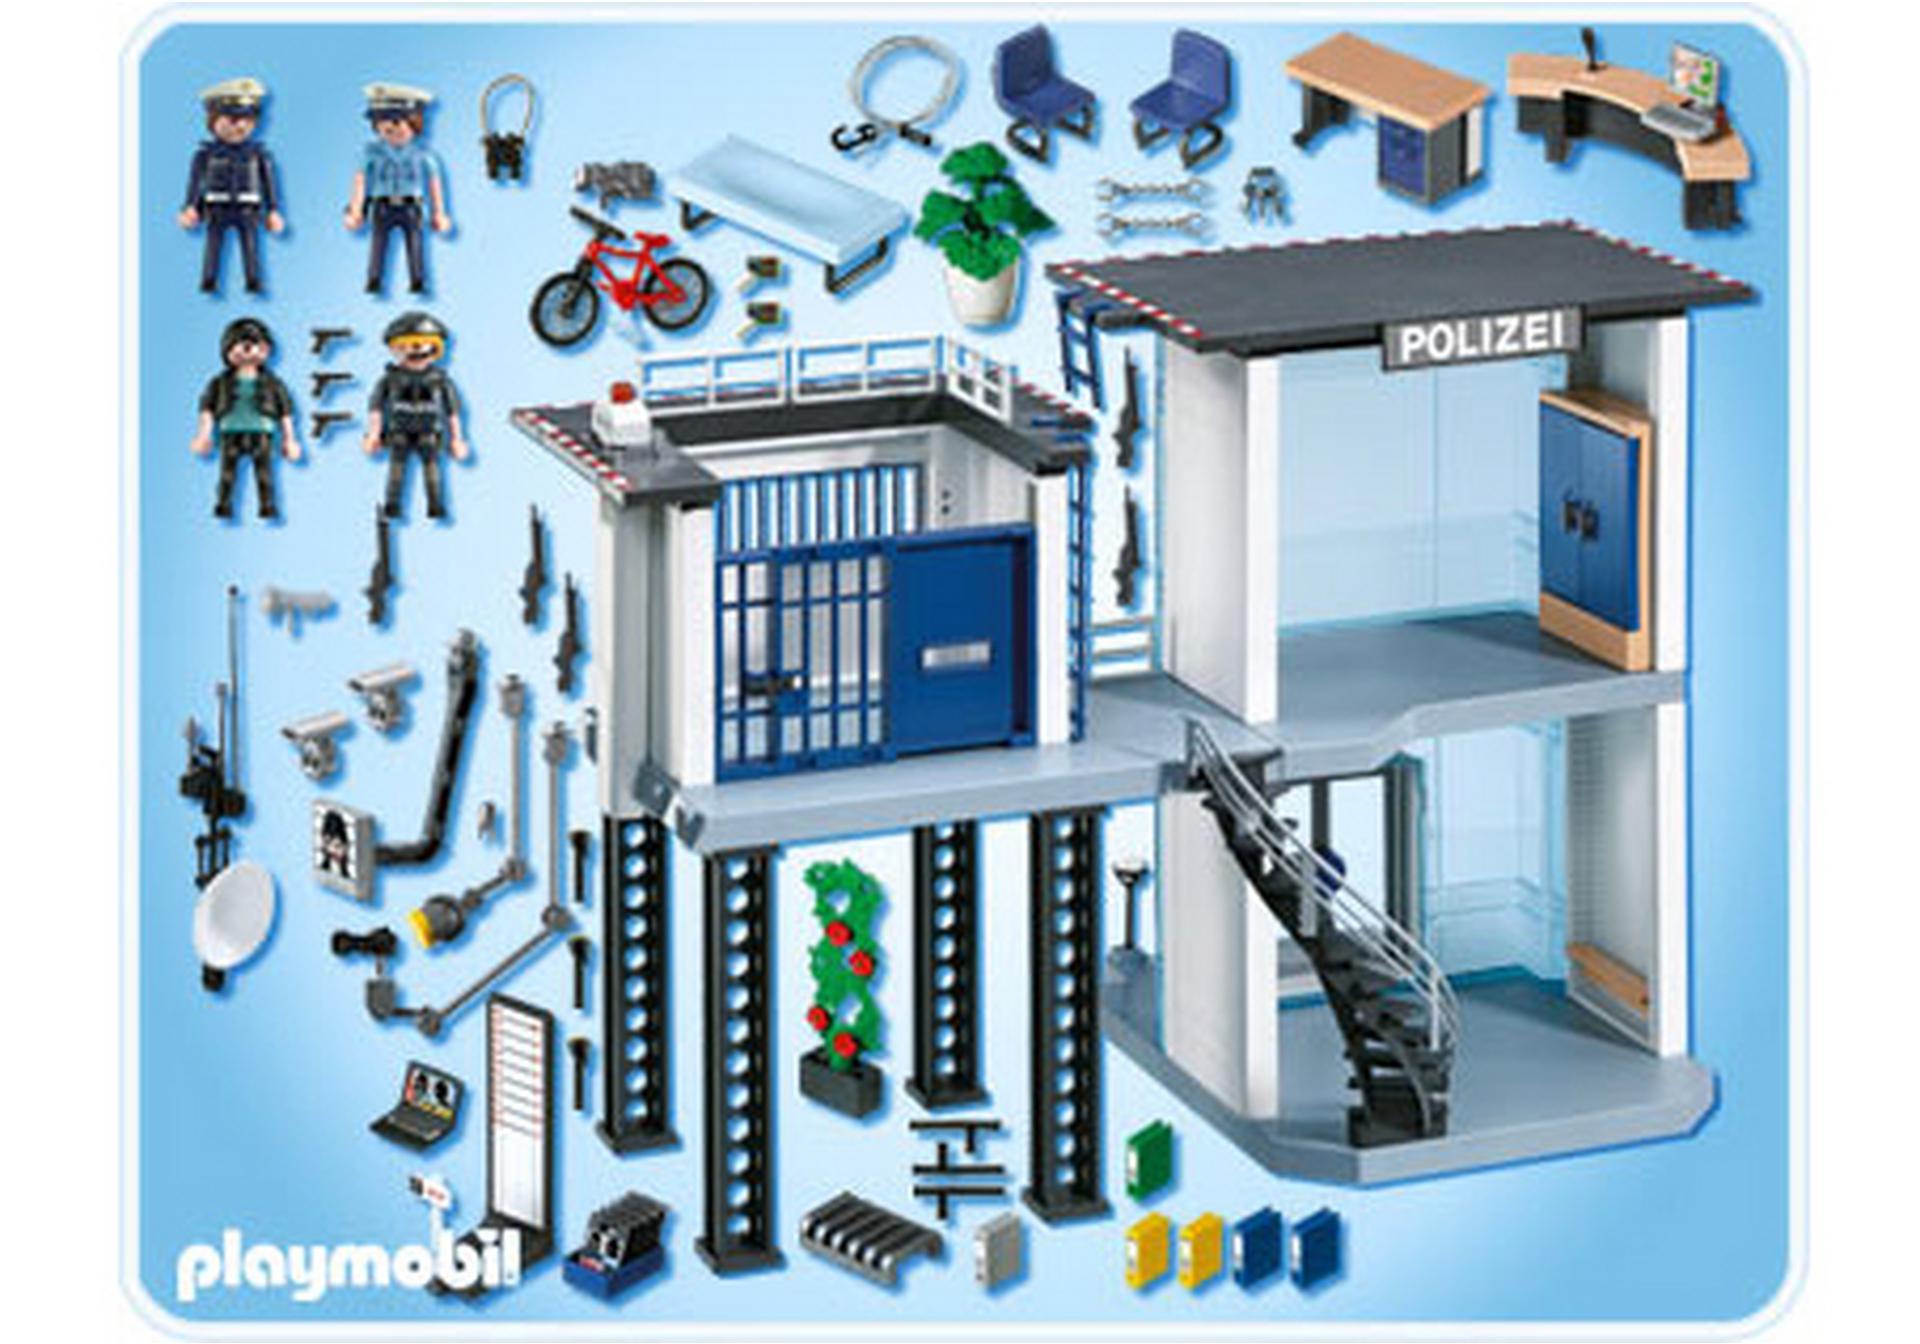 Polizei Kommandostation Mit Alarmanlage 5176 A Playmobil